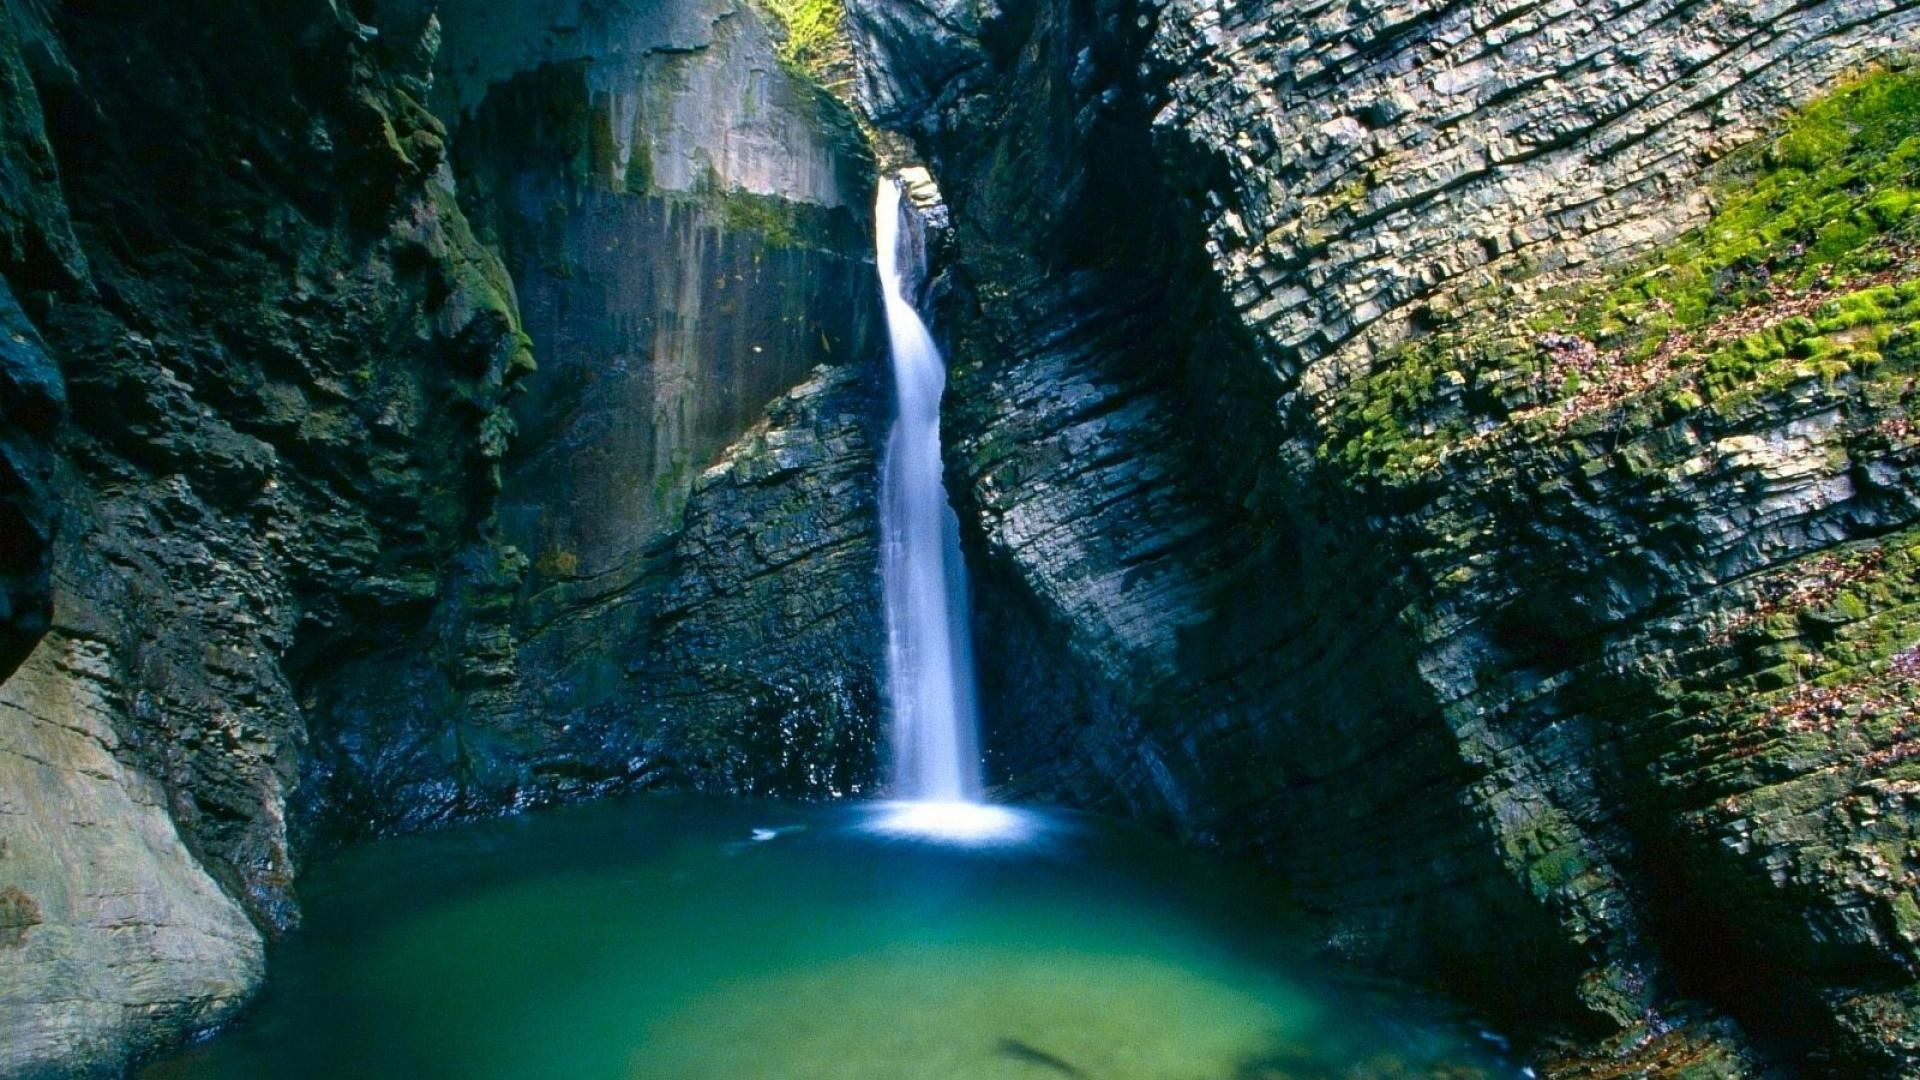 Awesome Nature Image